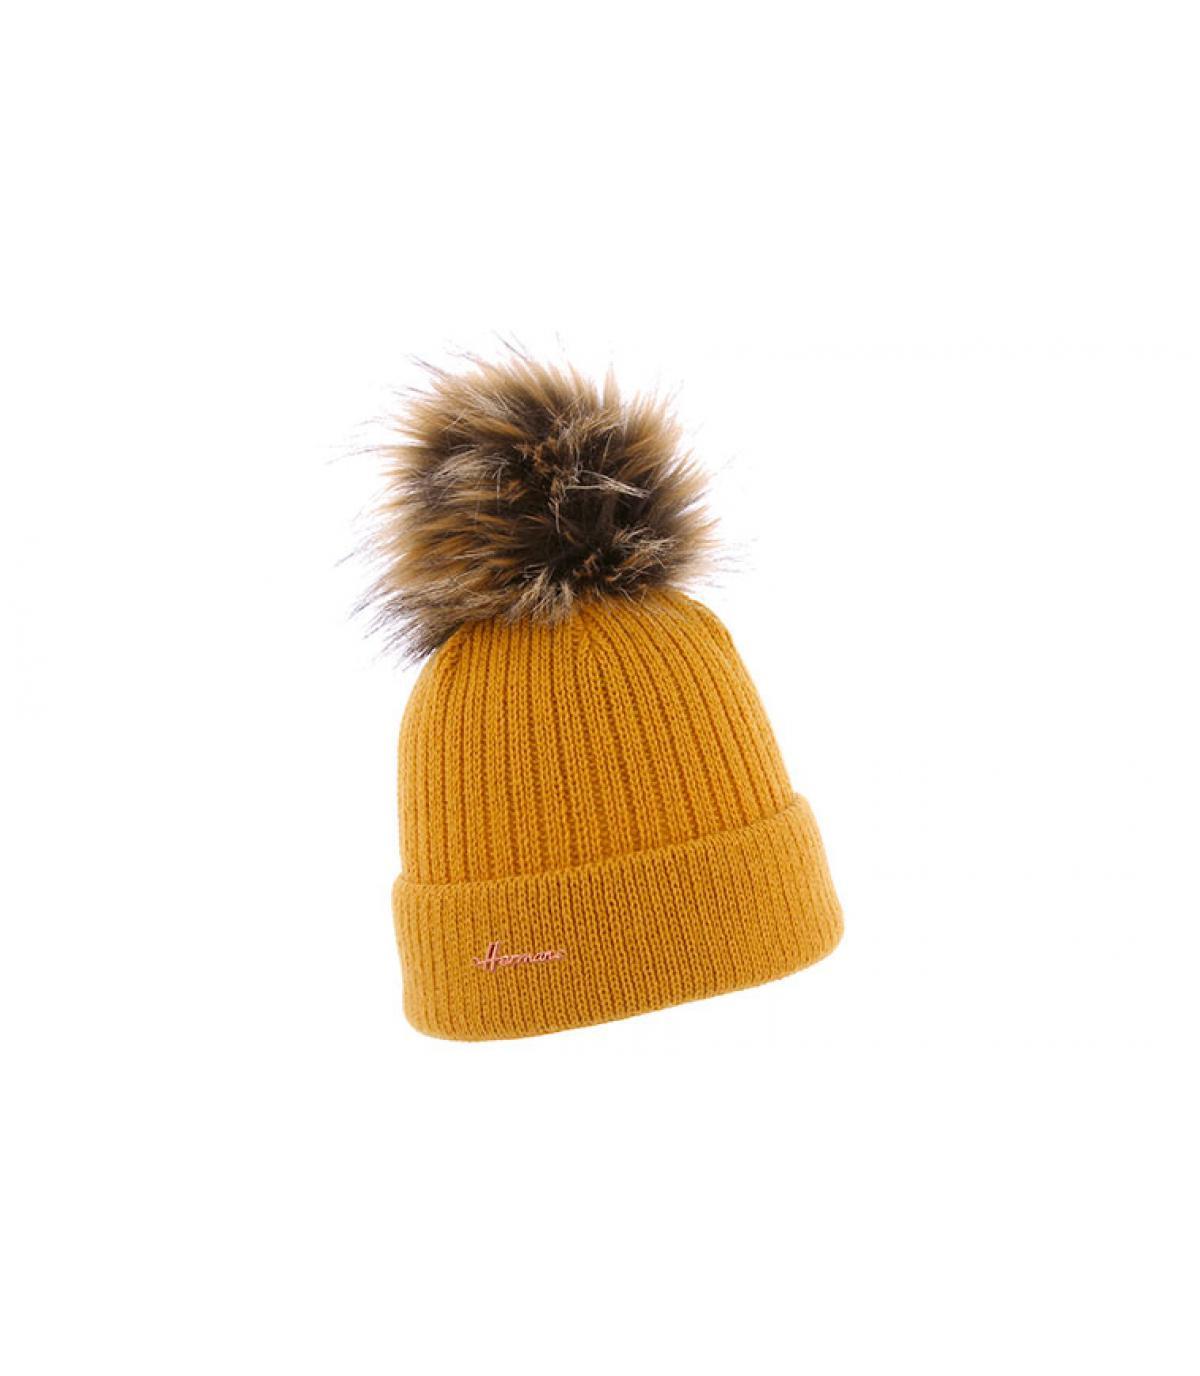 pomponbont met gele hoed